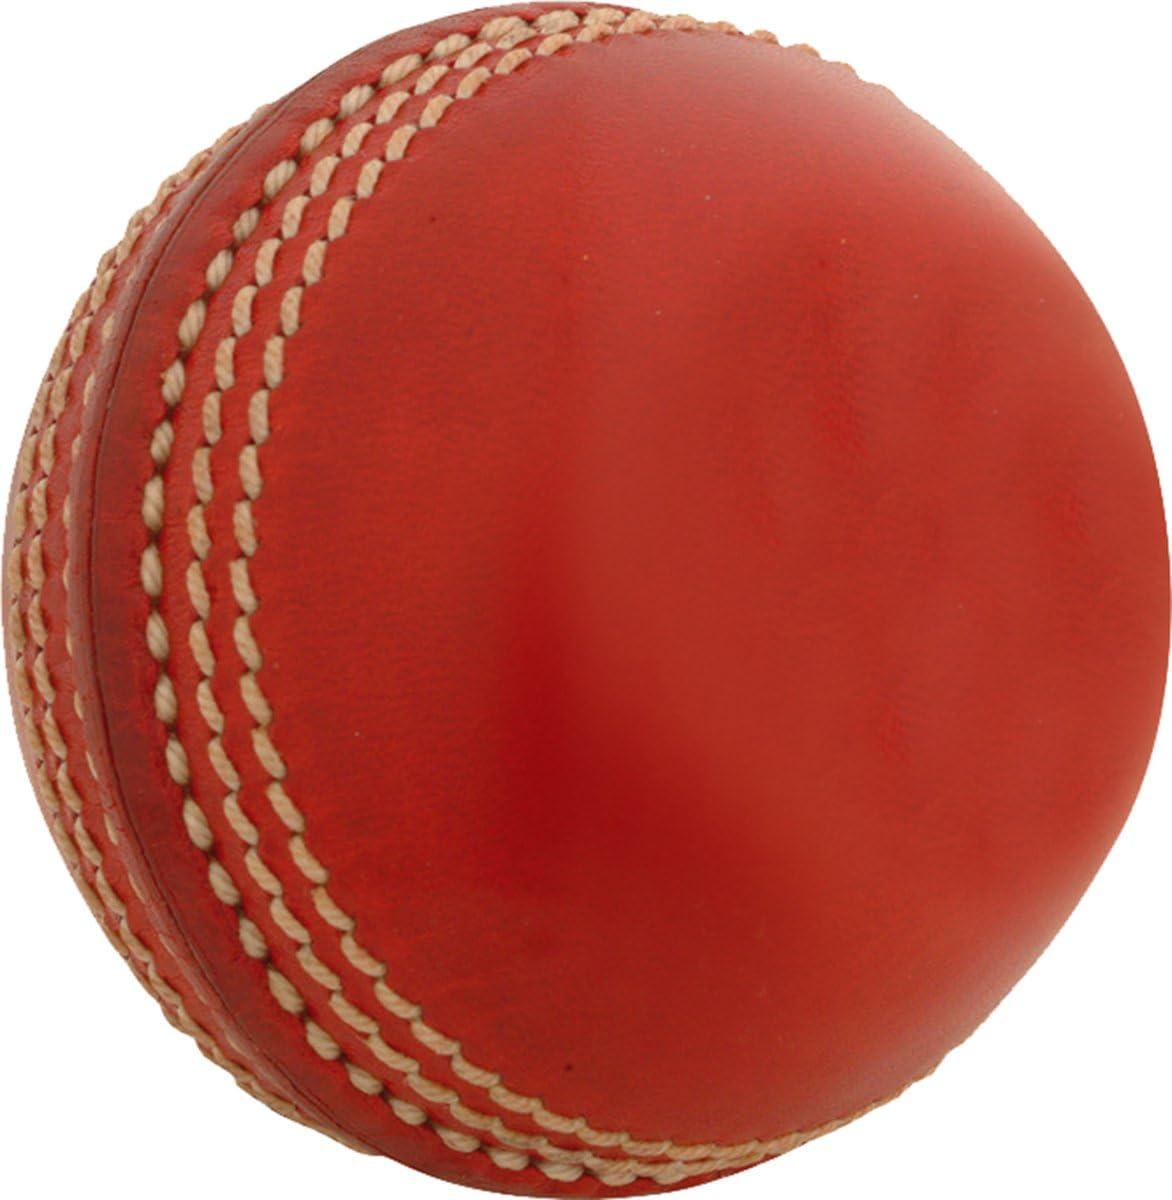 Gray Nicolls Cricket Sports Ball Tulsa Ranking TOP14 Mall Miniature Promotional